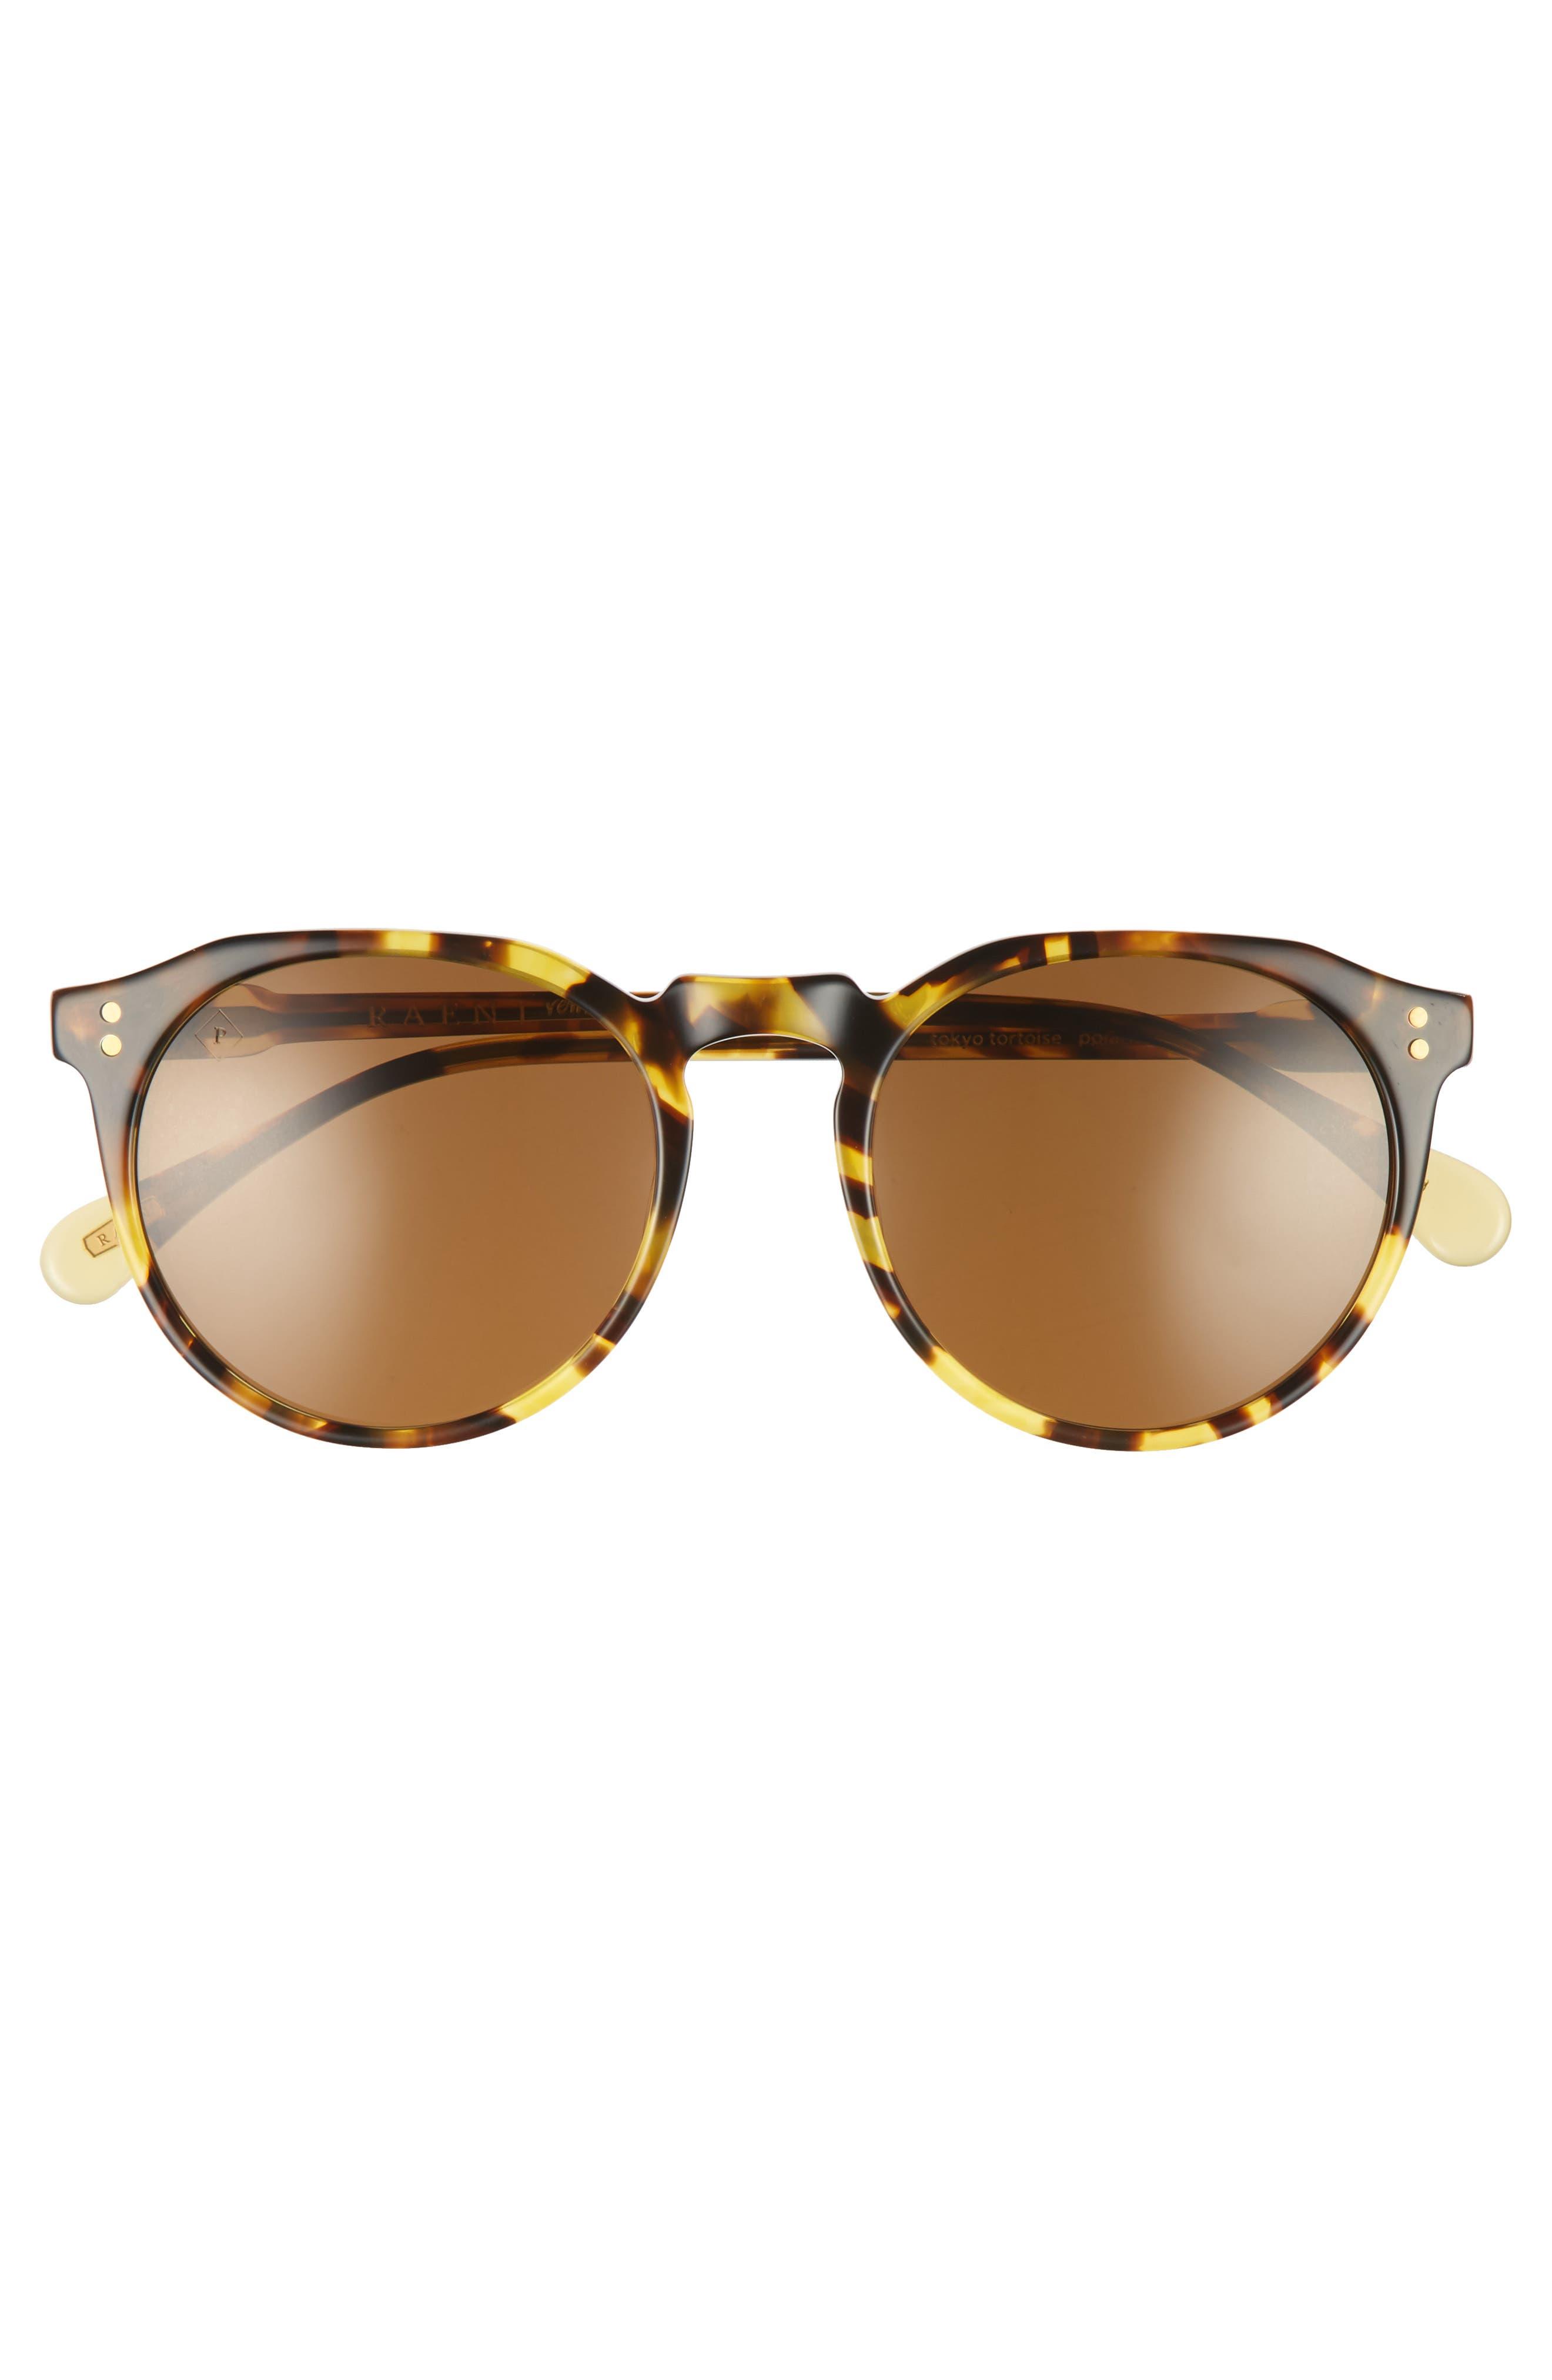 Remmy 52mm Polarized Sunglasses,                             Alternate thumbnail 2, color,                             Tokyo Tortoise/ Brown